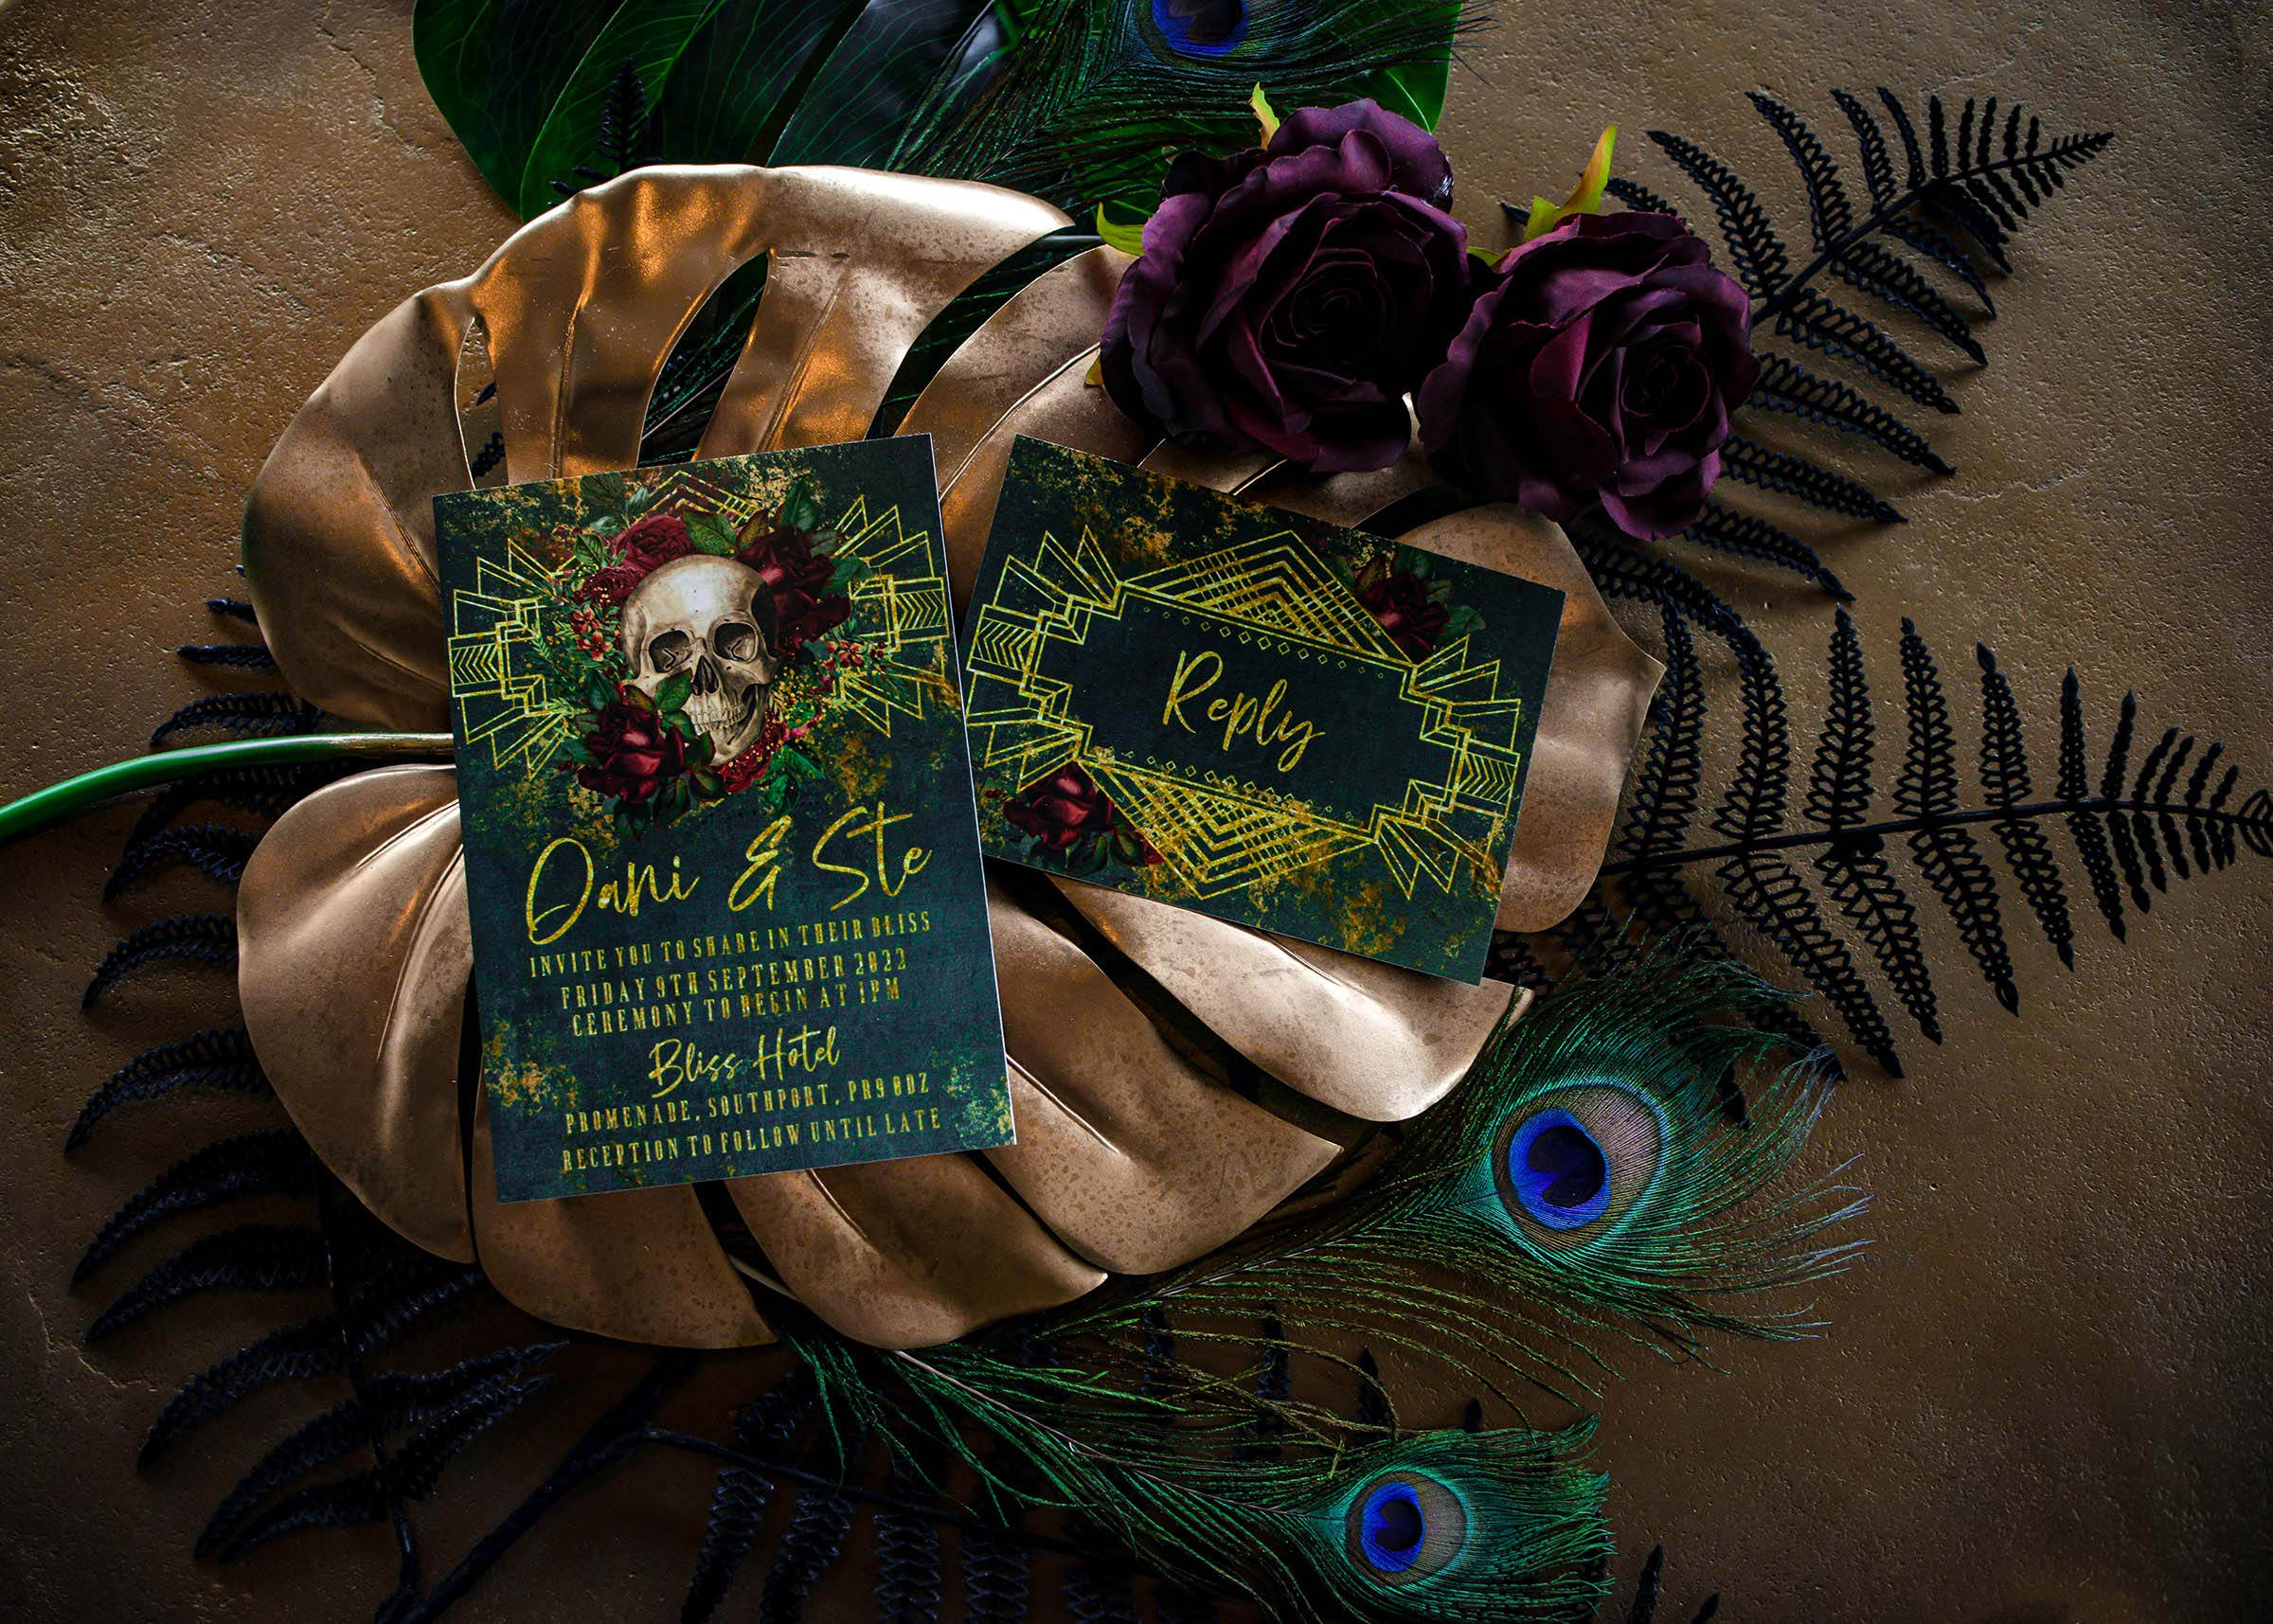 alternative luxe wedding - slytherin wedding - gothic wedding - alternative wedding - alternative wedding stationery - gothic wedding stationery - unique wedding invitations